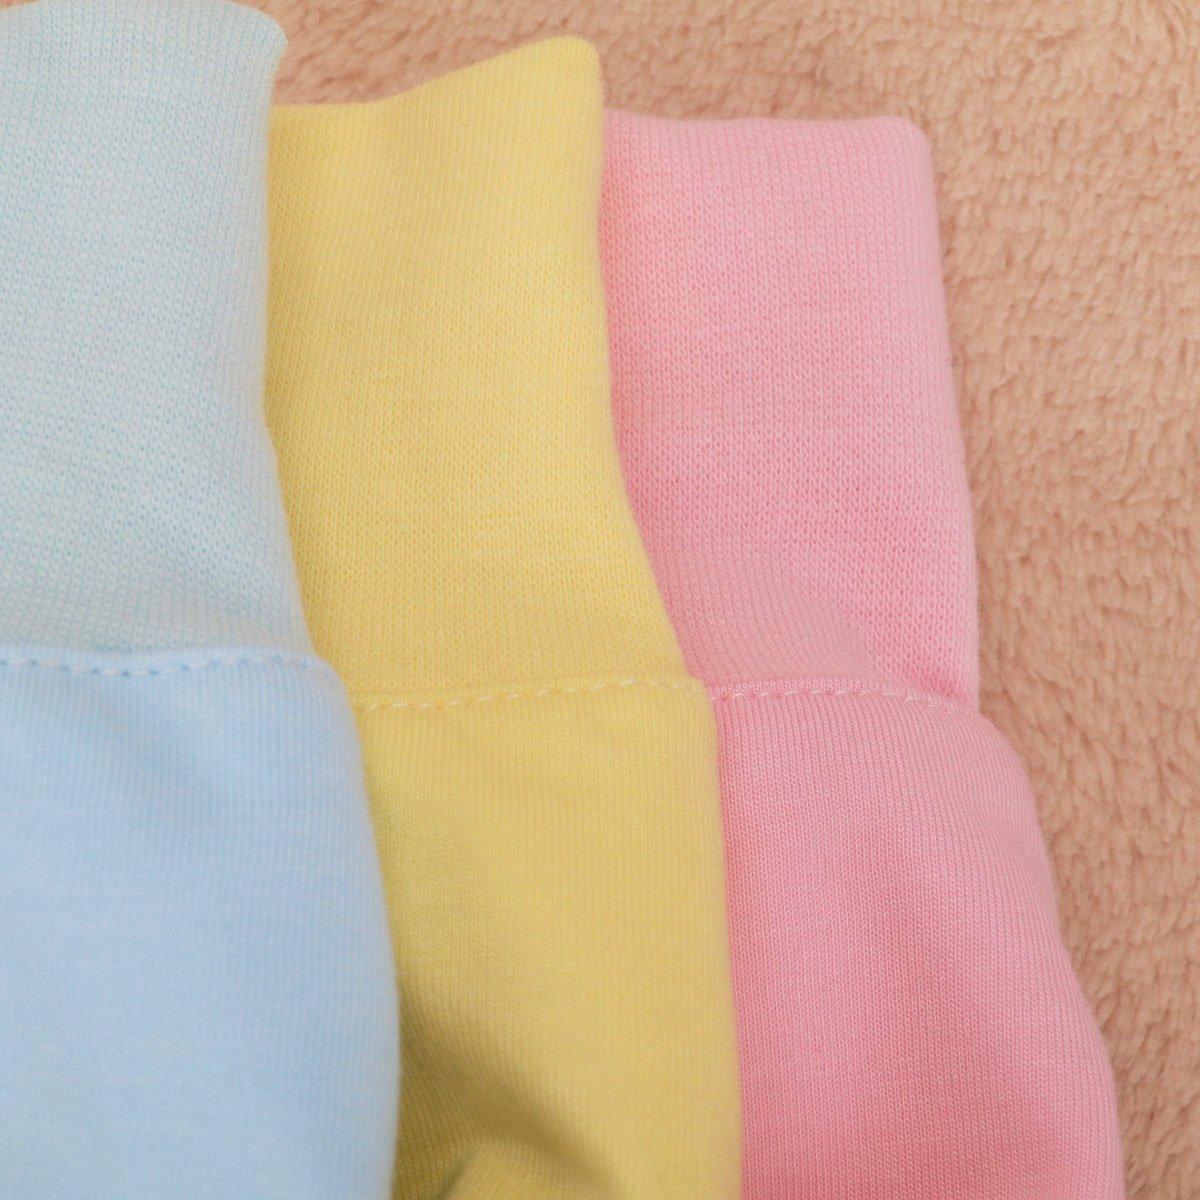 Girls Boys Training Pants Toddler Training Underwear Reusable Waterproof Potty 12-24 Months Blue